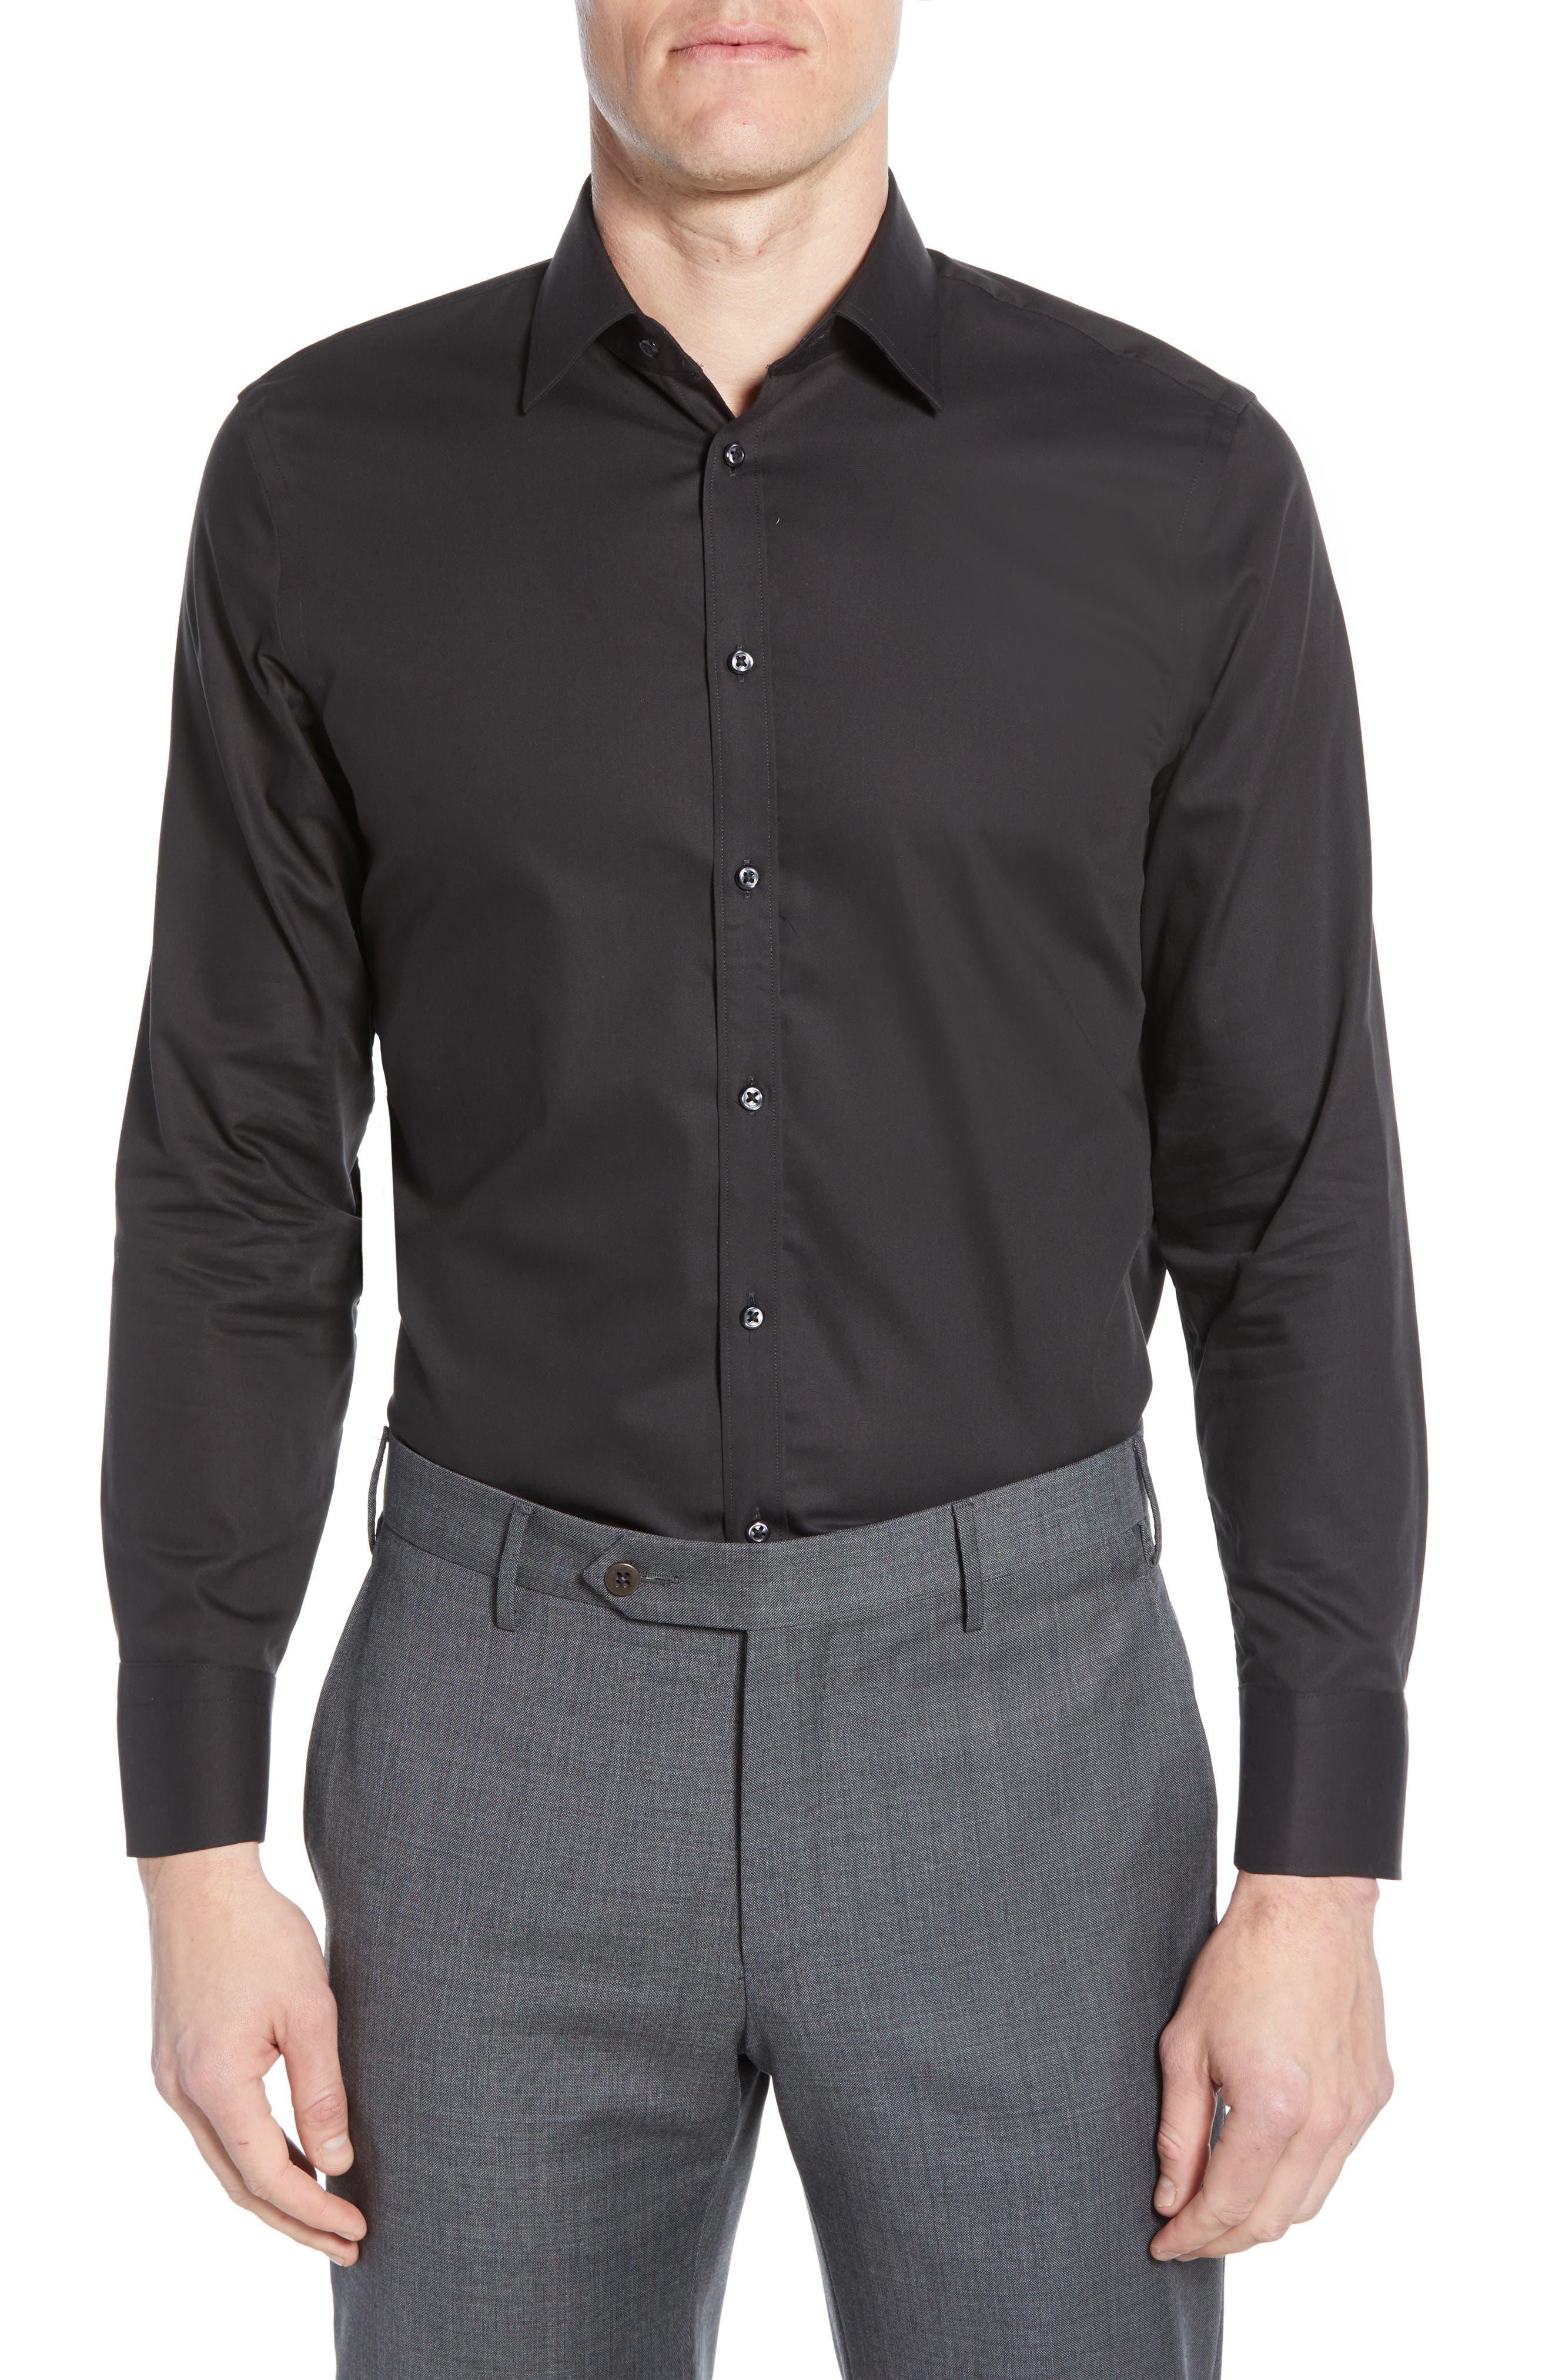 NORDSTROM MEN'S SHOP,                             Extra Trim Fit Non-Iron Solid Dress Shirt,                             Main thumbnail 1, color,                             BLACK ROCK